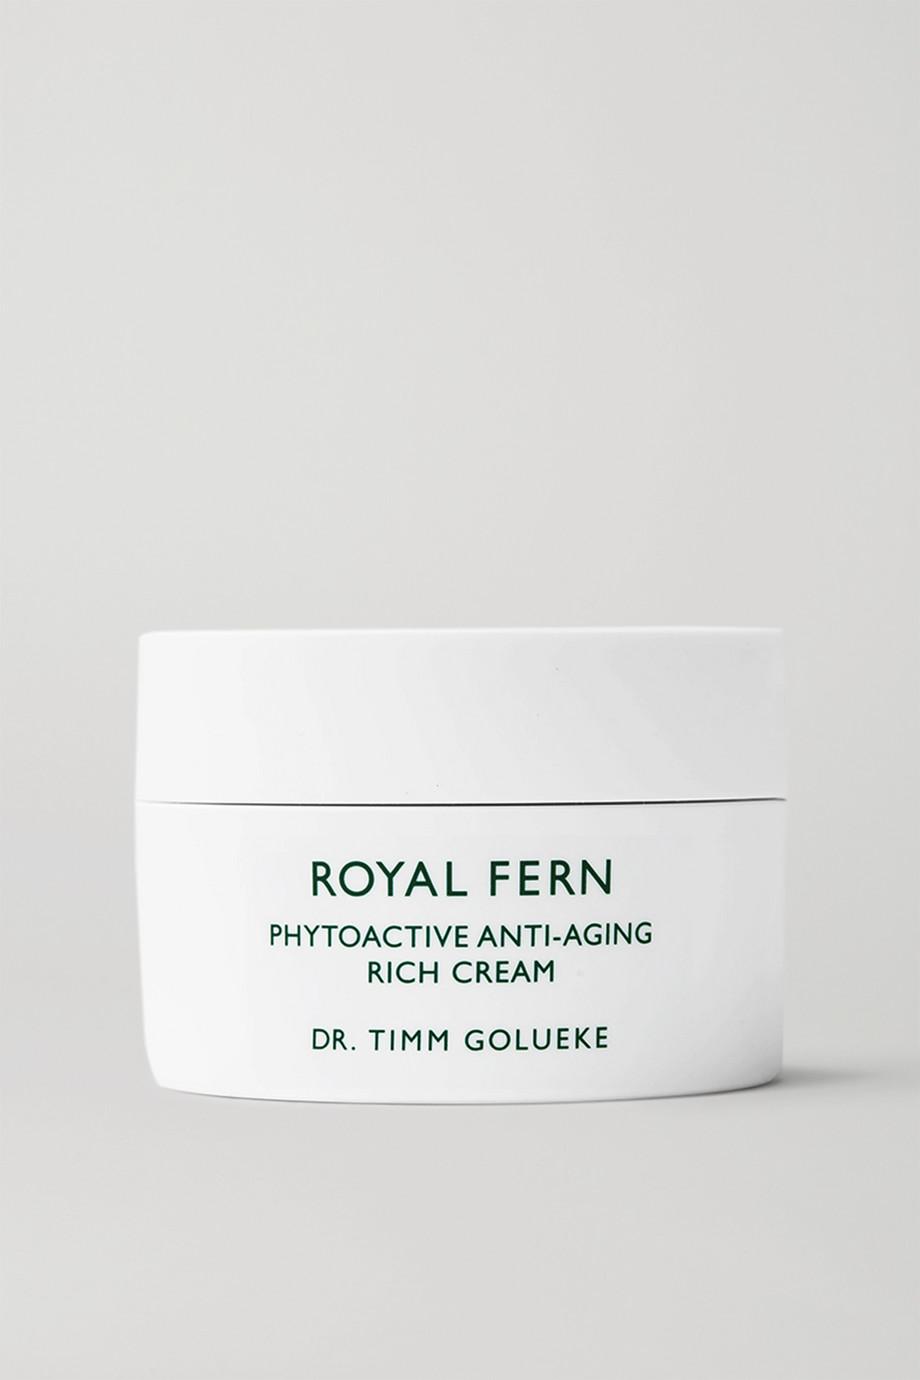 Royal Fern 植物活肤抗衰老丰润面霜,50ml